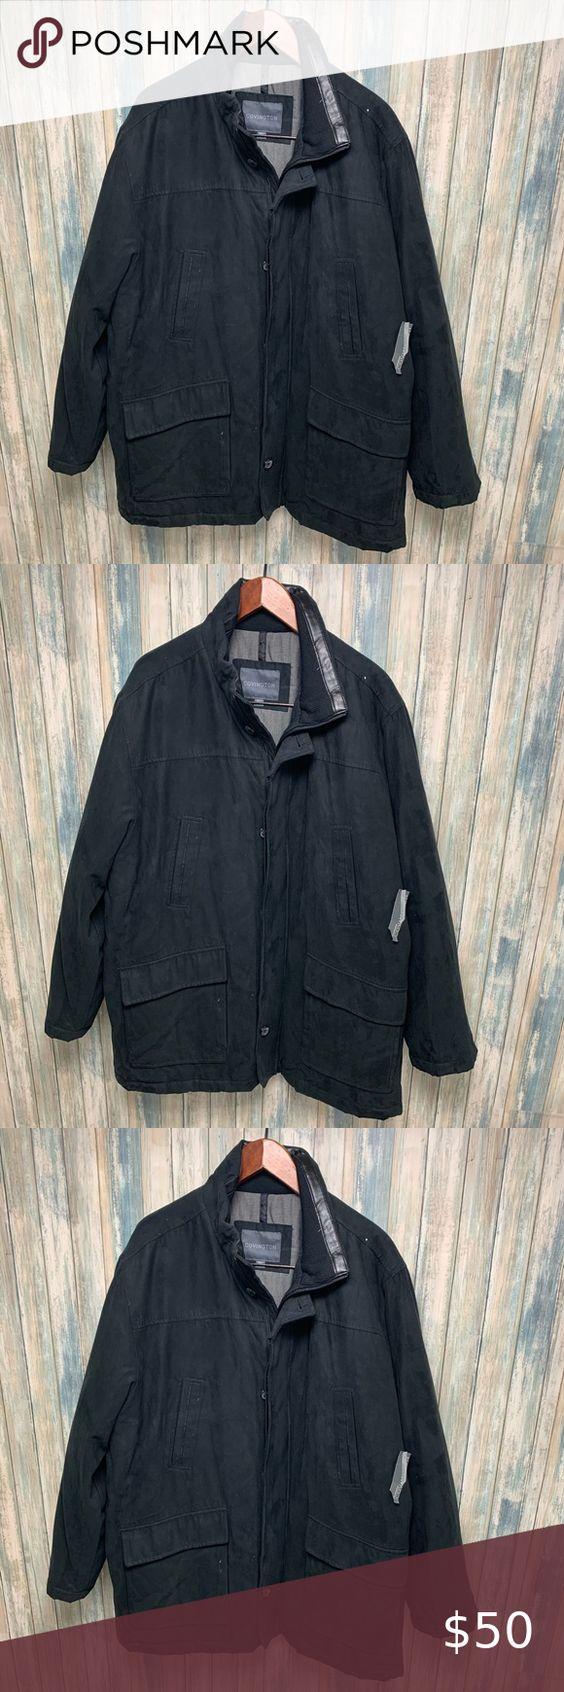 Covington Men S Jacket Sz Xl Microsuede New Clothes Design Jackets Microsuede [ 1692 x 564 Pixel ]